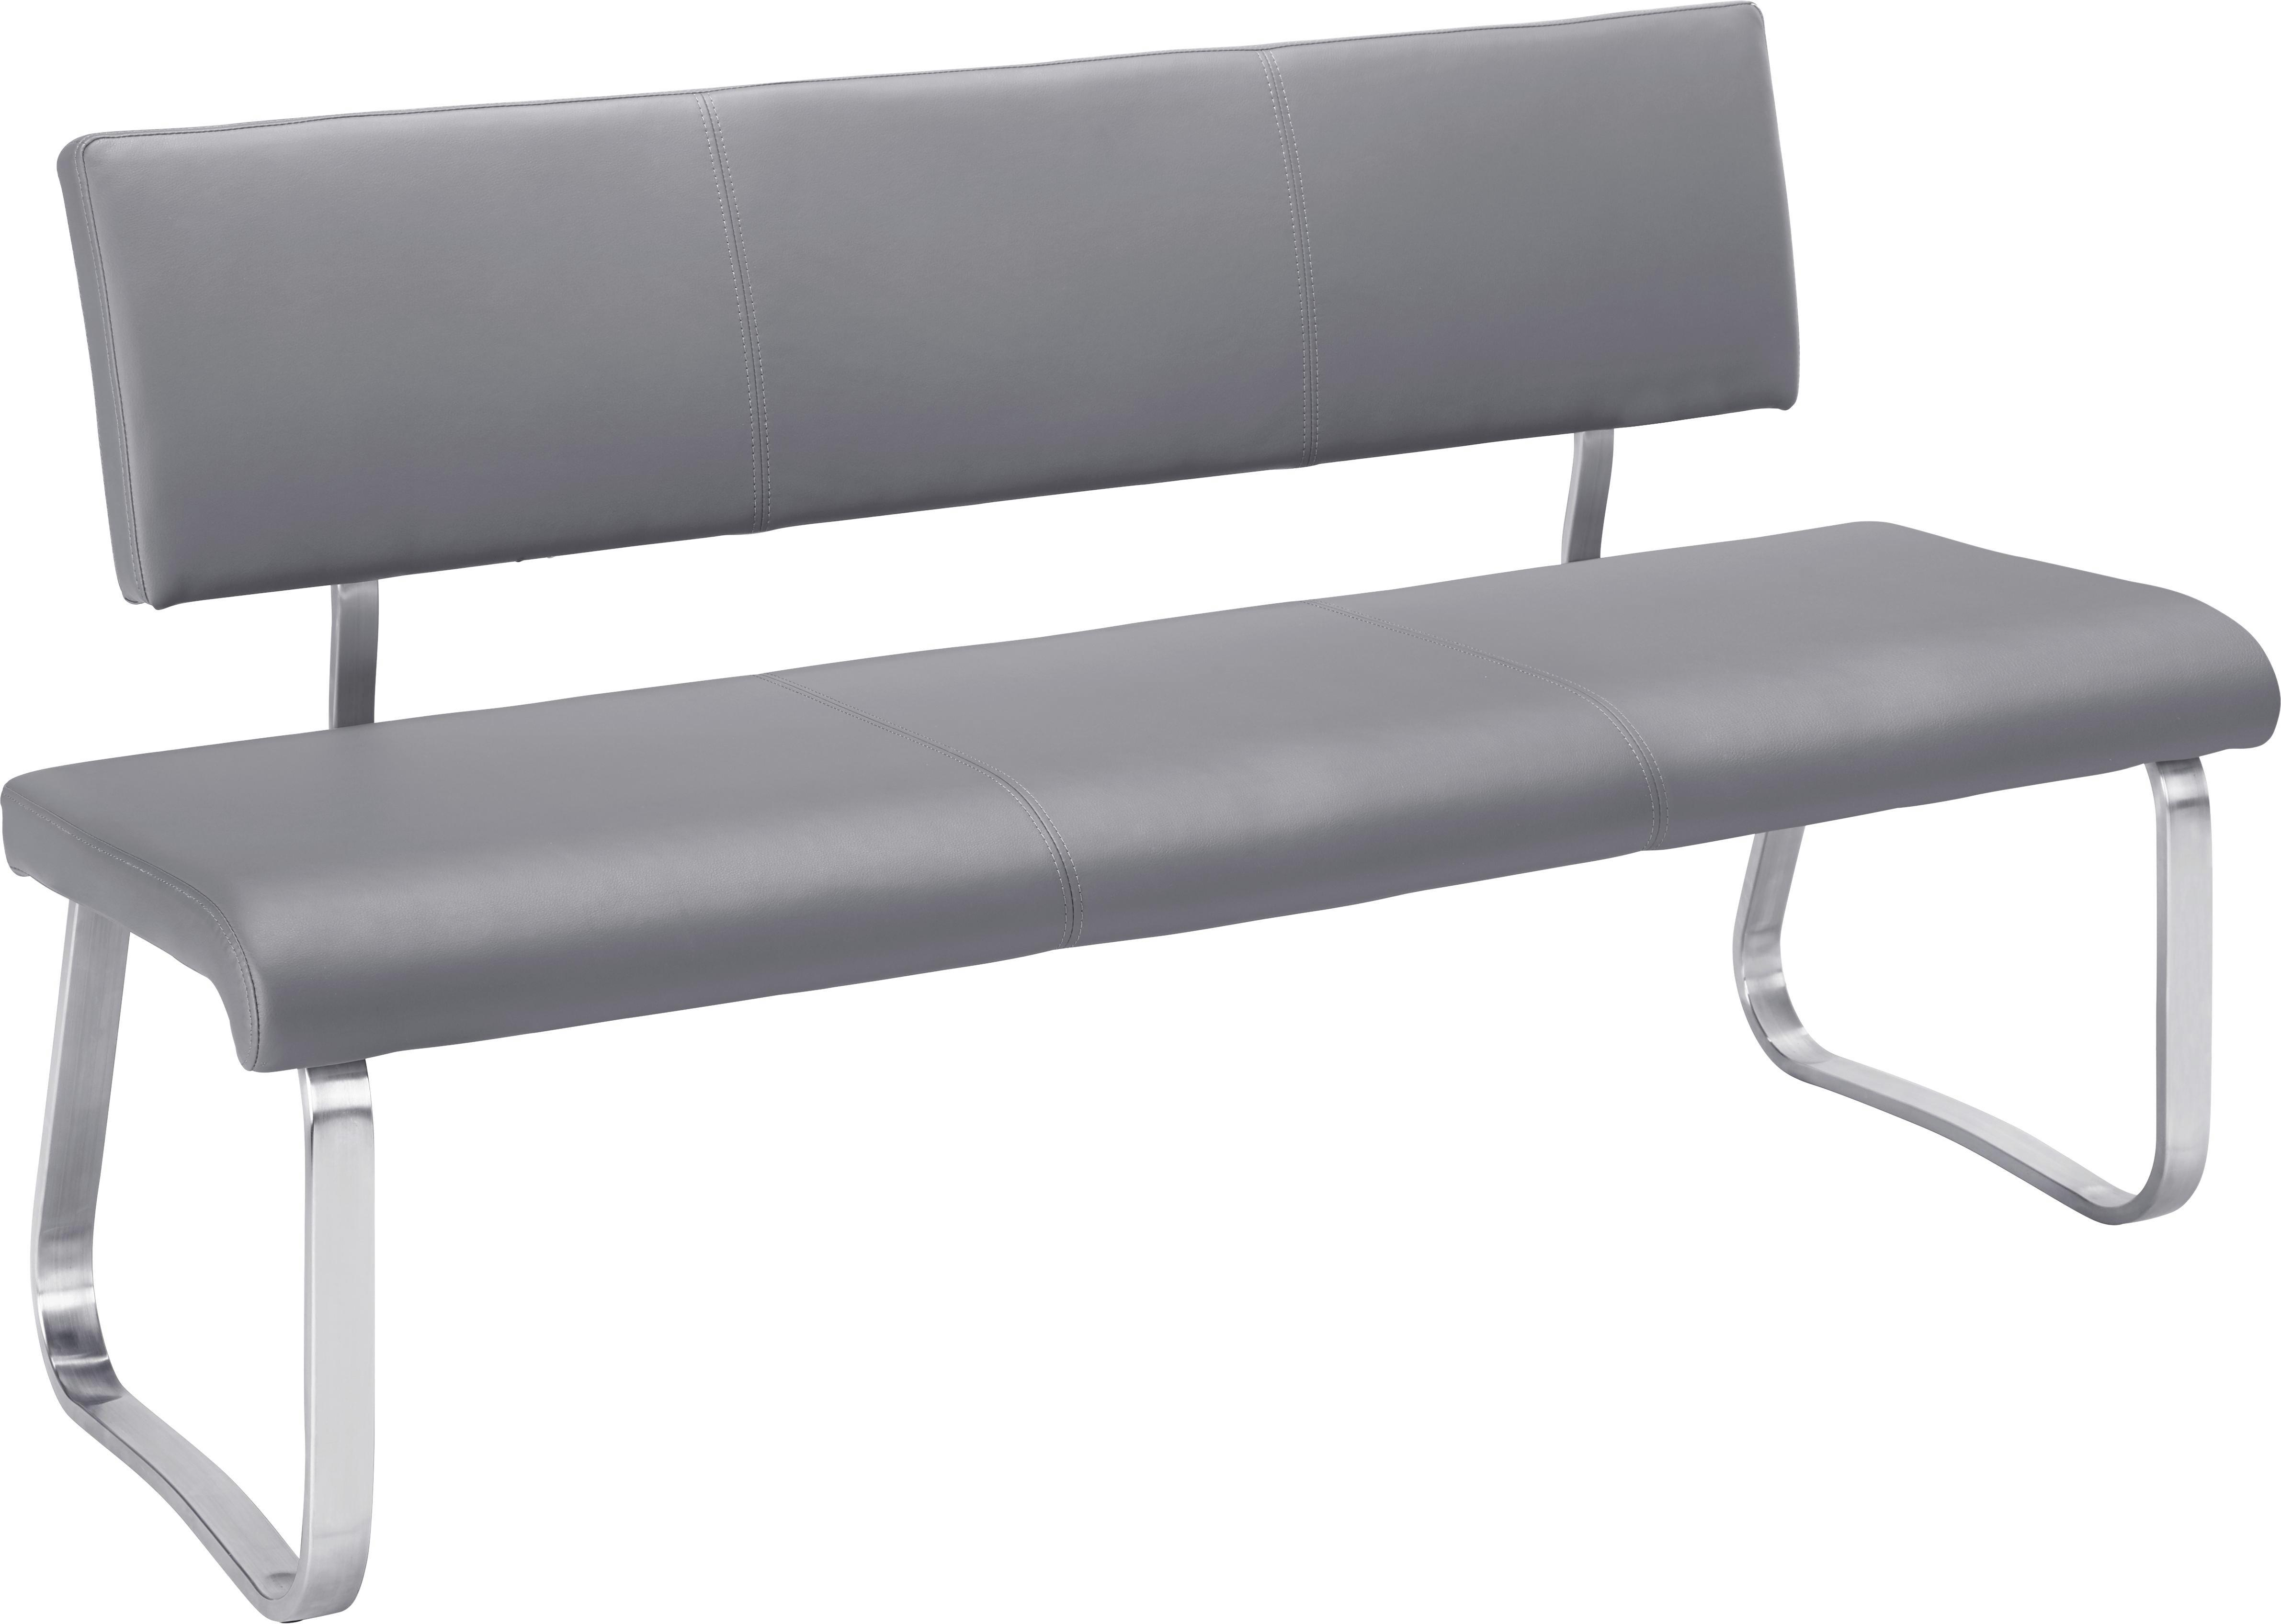 sitzbank free maxi bild xxl biedermeier sofa sitzbank in. Black Bedroom Furniture Sets. Home Design Ideas